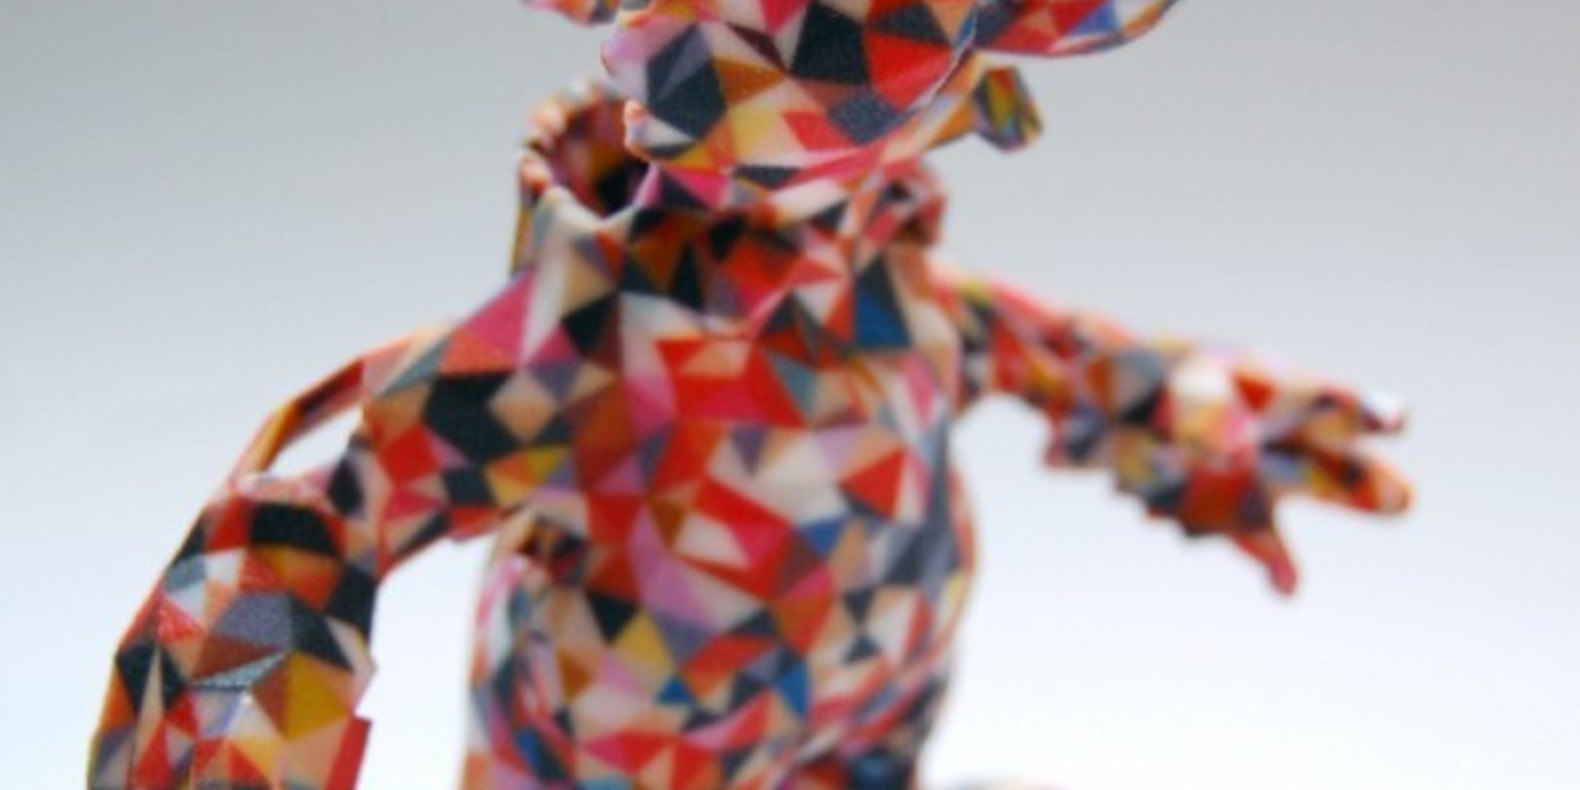 sekuMoiMecy Matthew Plummer-Fernandez impression 3D printing cults fichier mickey mouse 8